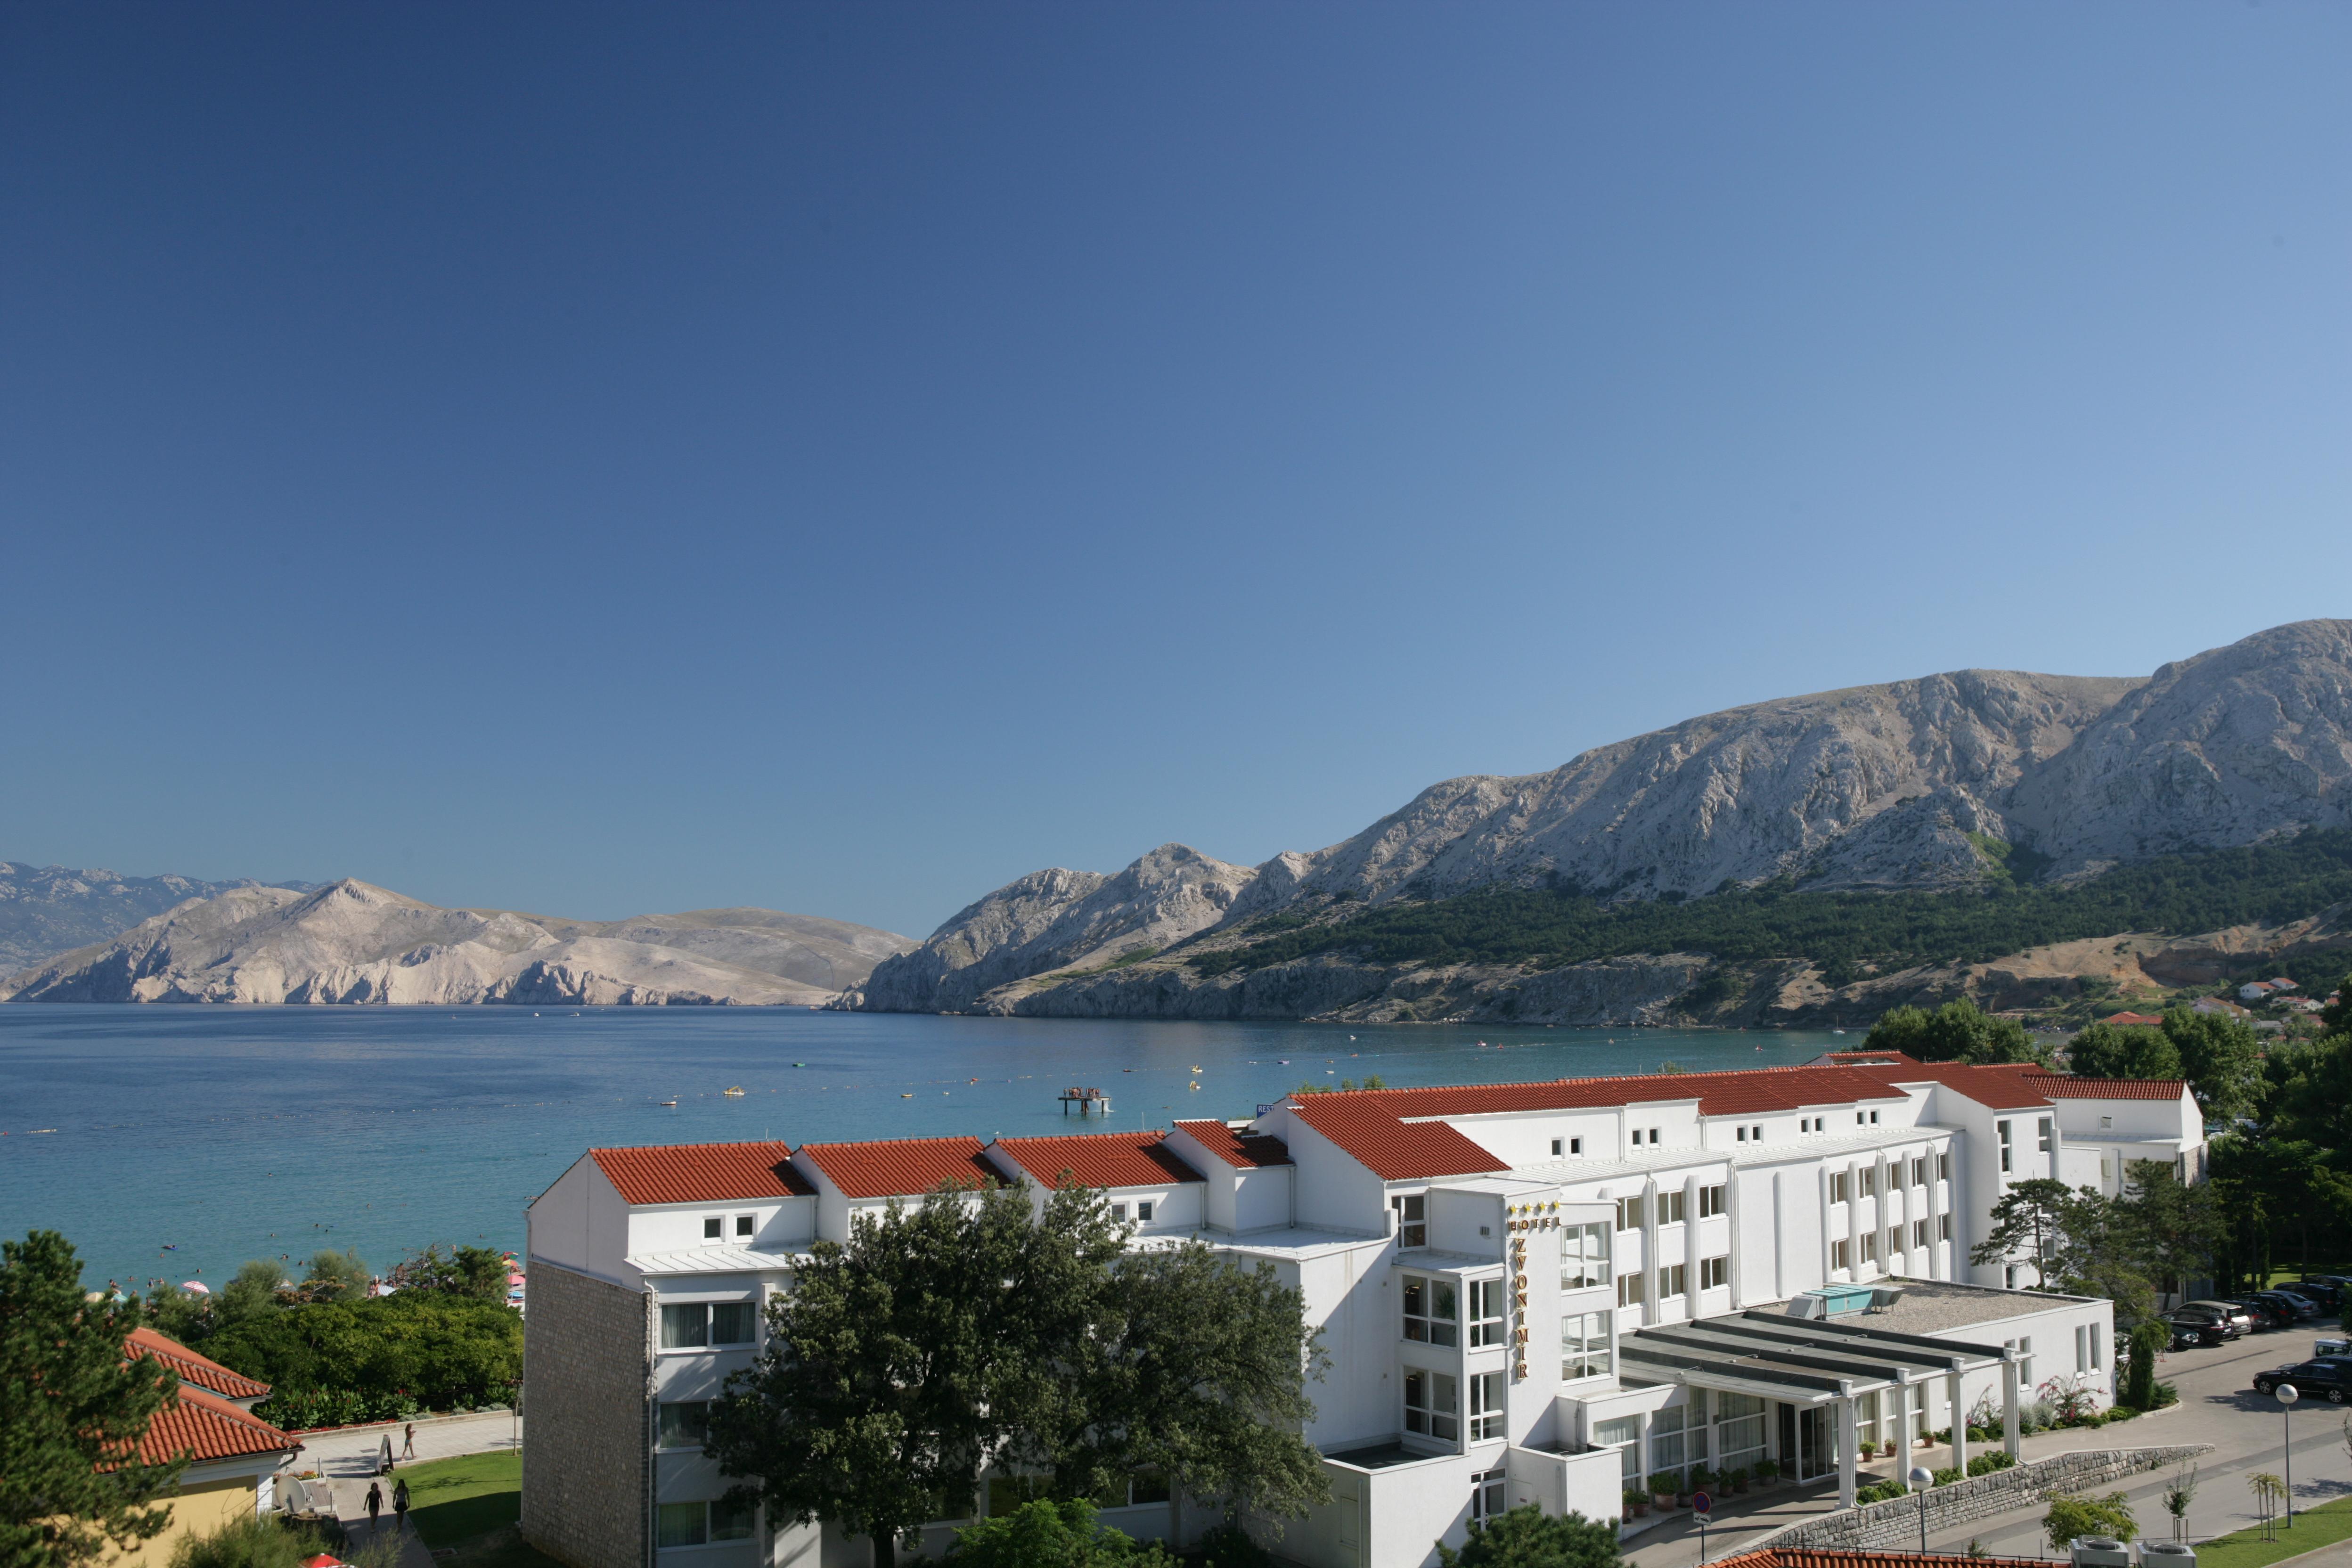 Adria Bike Hotel Zvonimir 4